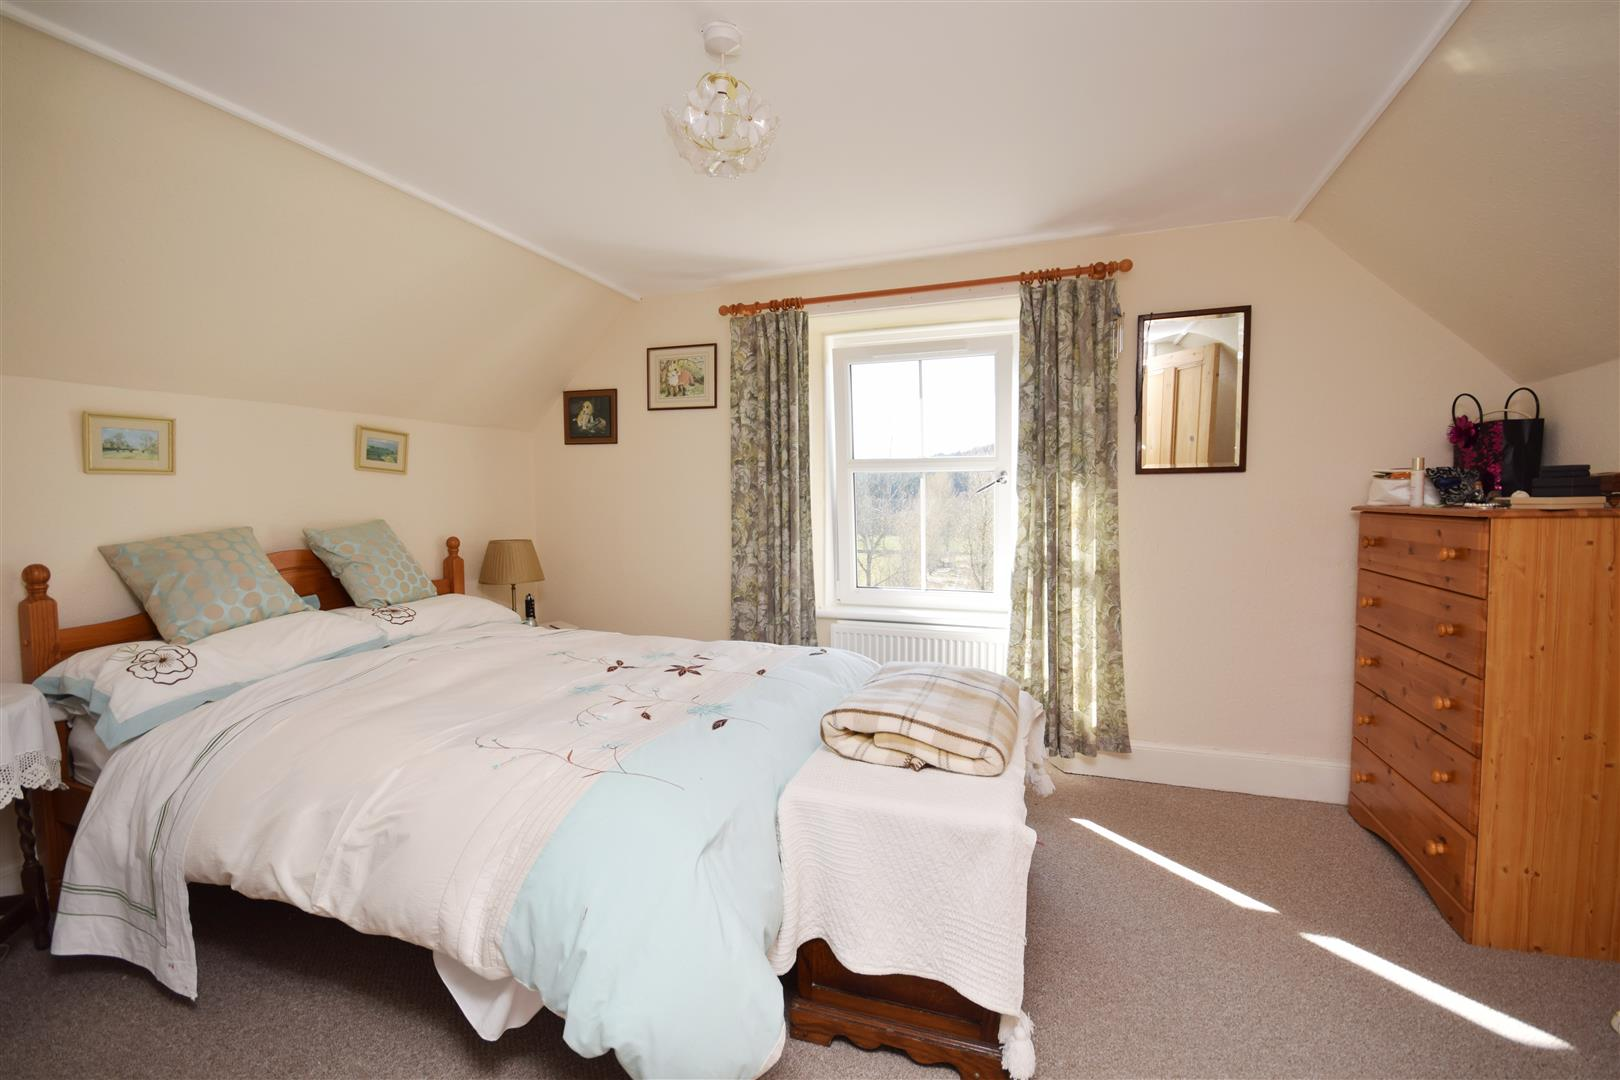 Ardchroskie House, Enochdhu, Blairgowrie, Perthshire, PH10 7PB, UK